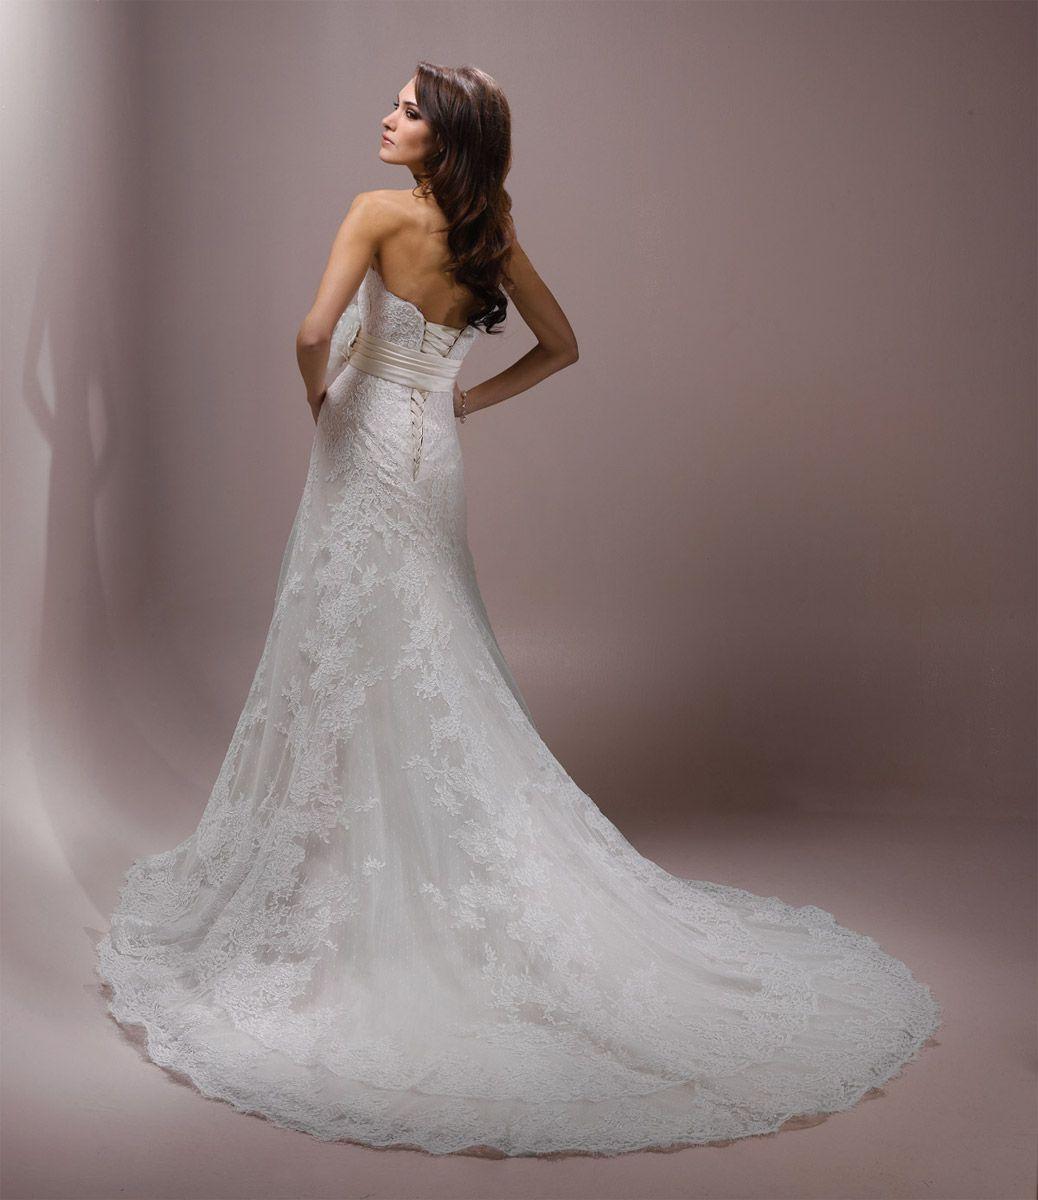 Maternity wedding dresses david's bridal  Maggie Sottero Presca MarieJAV Maggie Sottero Bridal Bridal